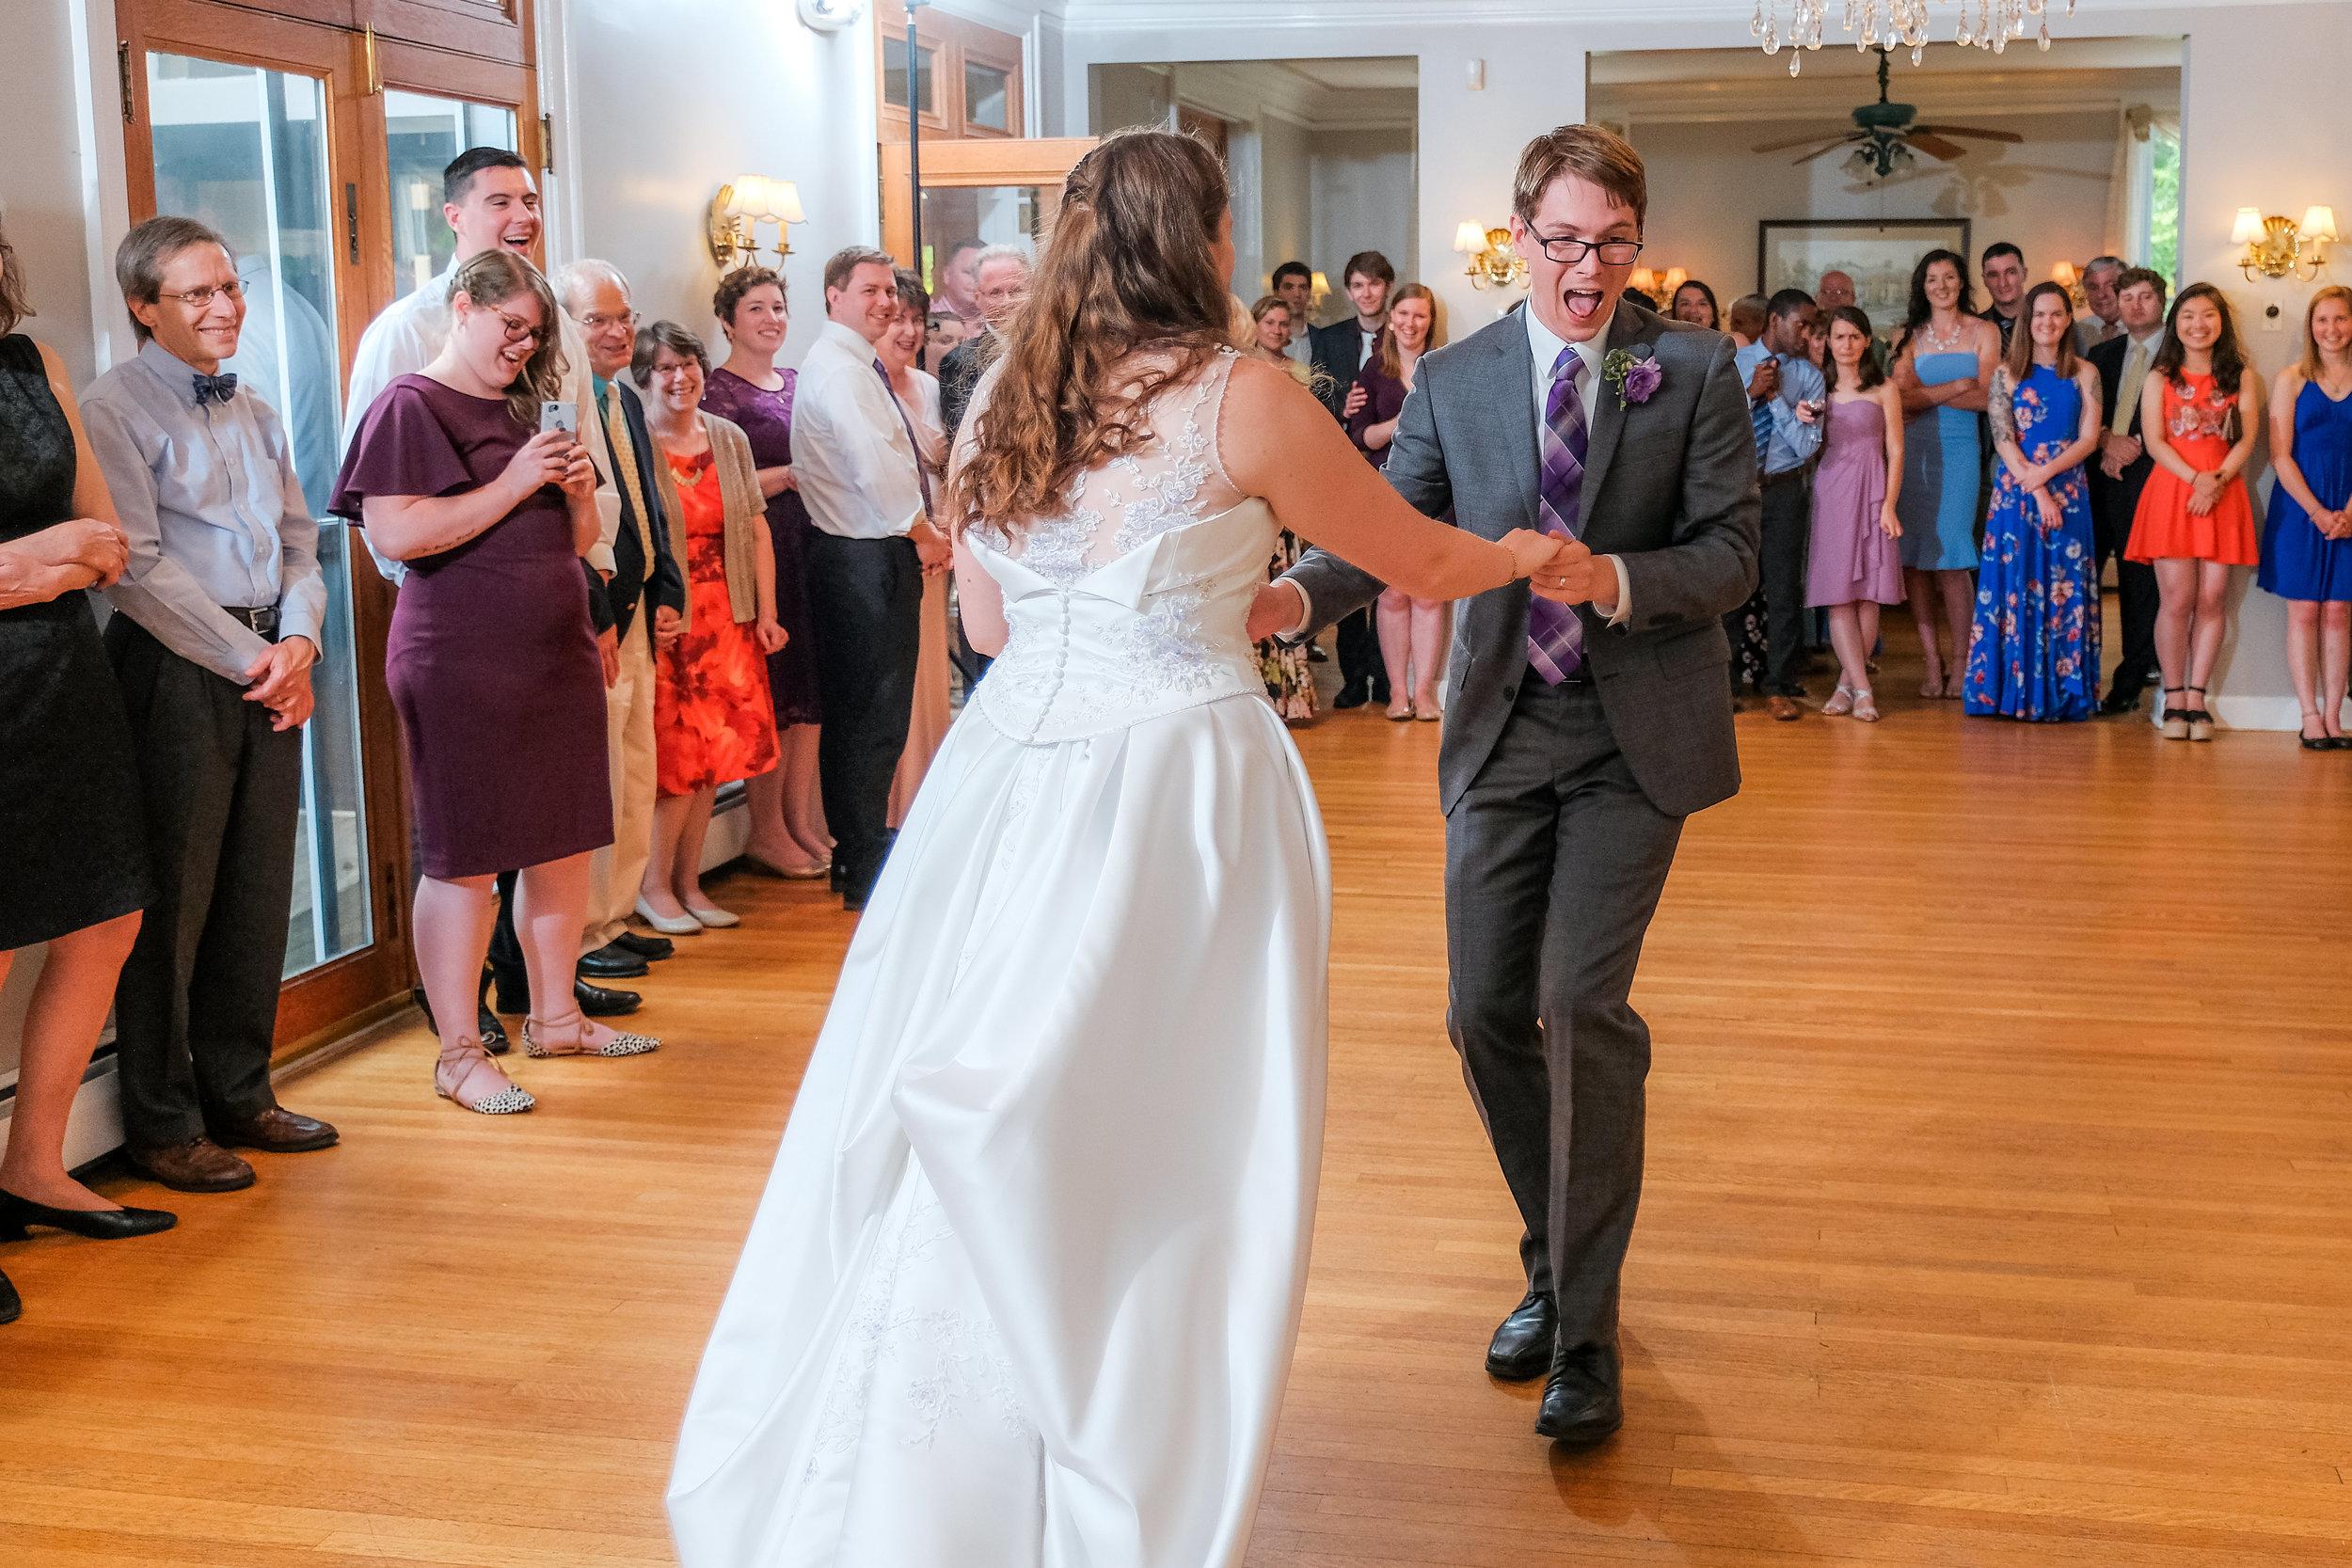 Vermont-Lilac-Inn-Wedding-Photography-1009.jpg